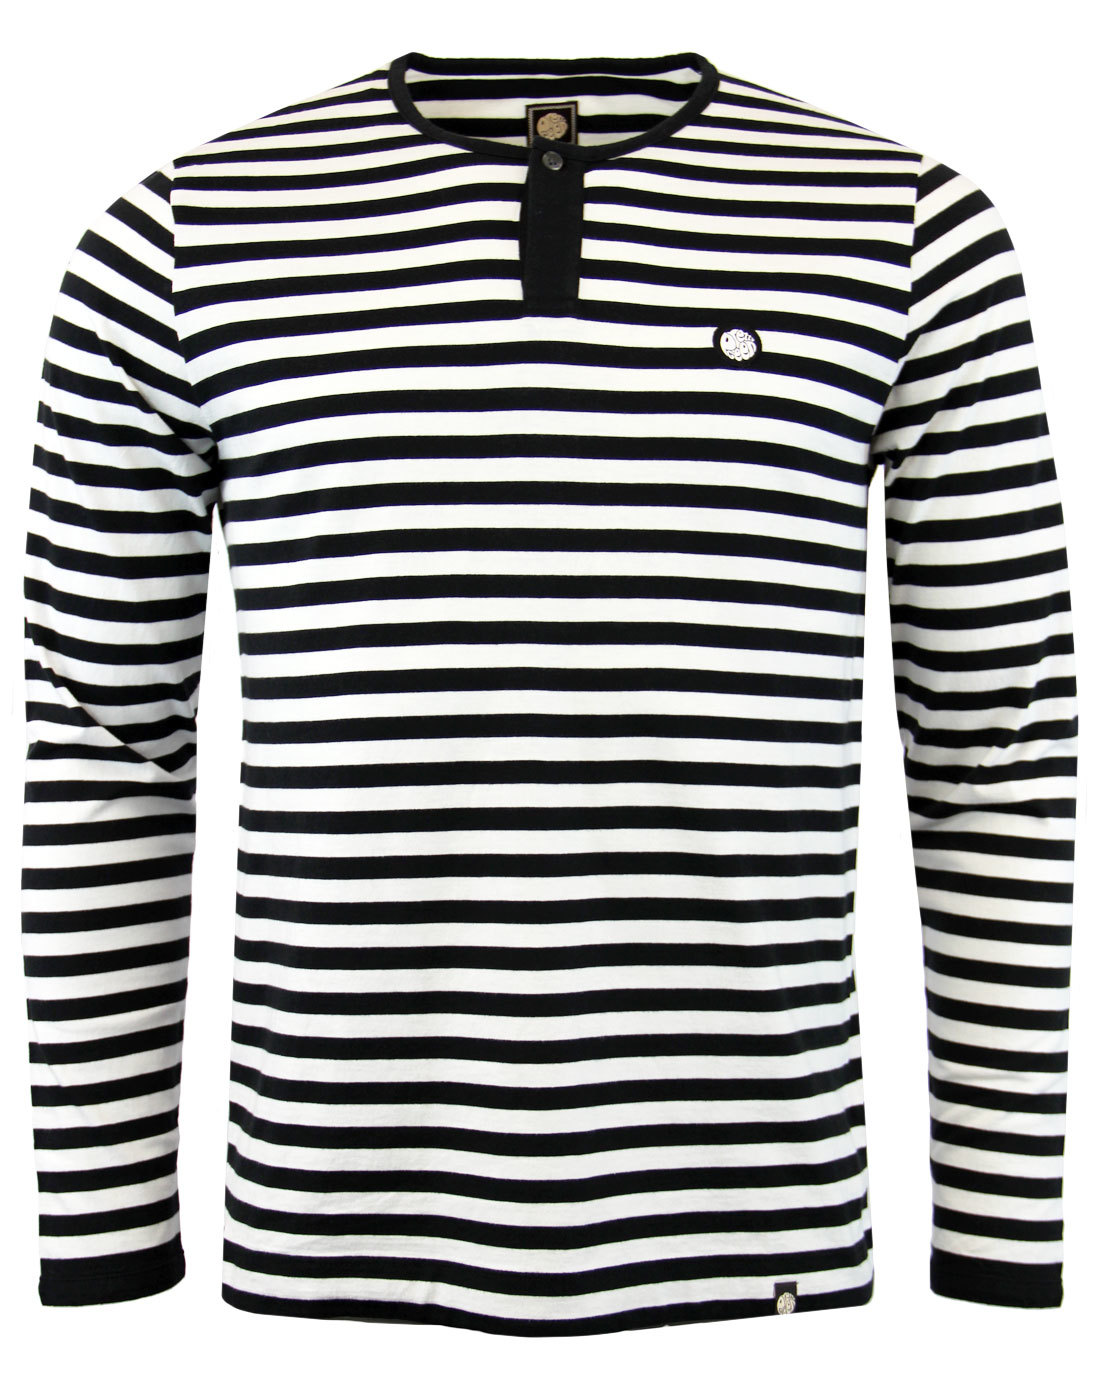 b227c4d1df167 PRETTY GREEN Redmond Retro Indie Mod Stripe Grandad T-Shirt Black